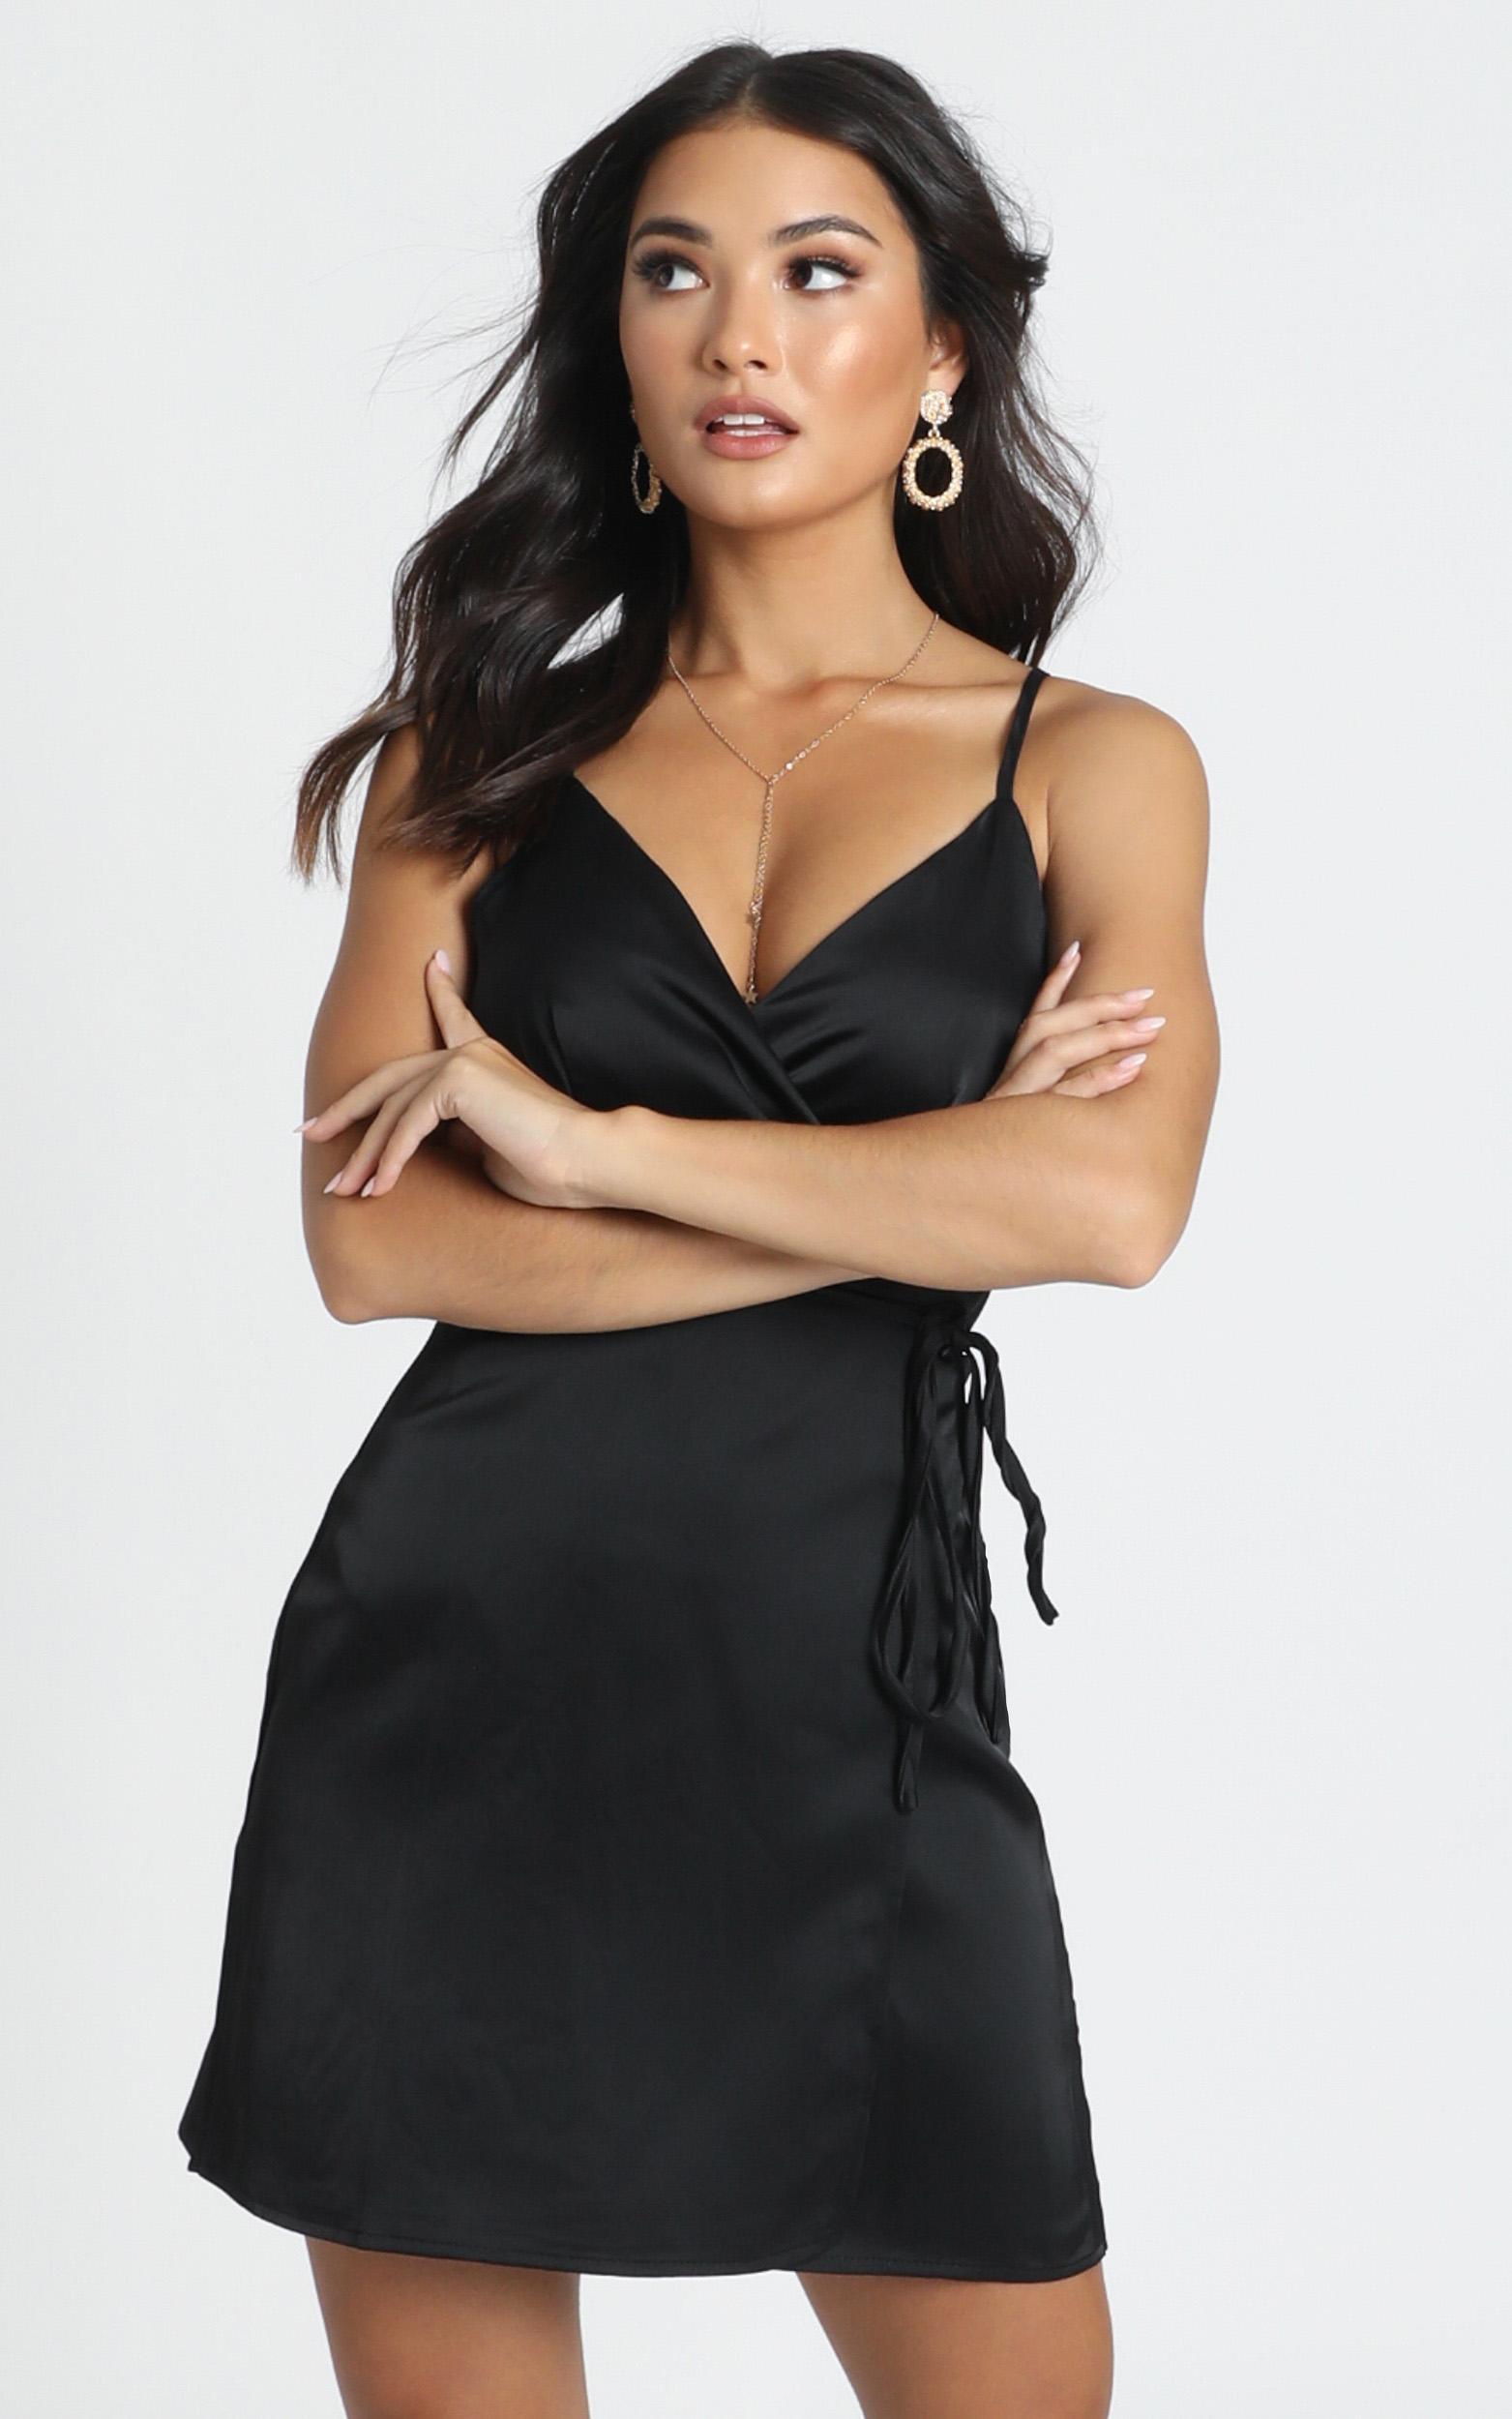 Mine Now Dress in black satin - 14 (XL), Black, hi-res image number null